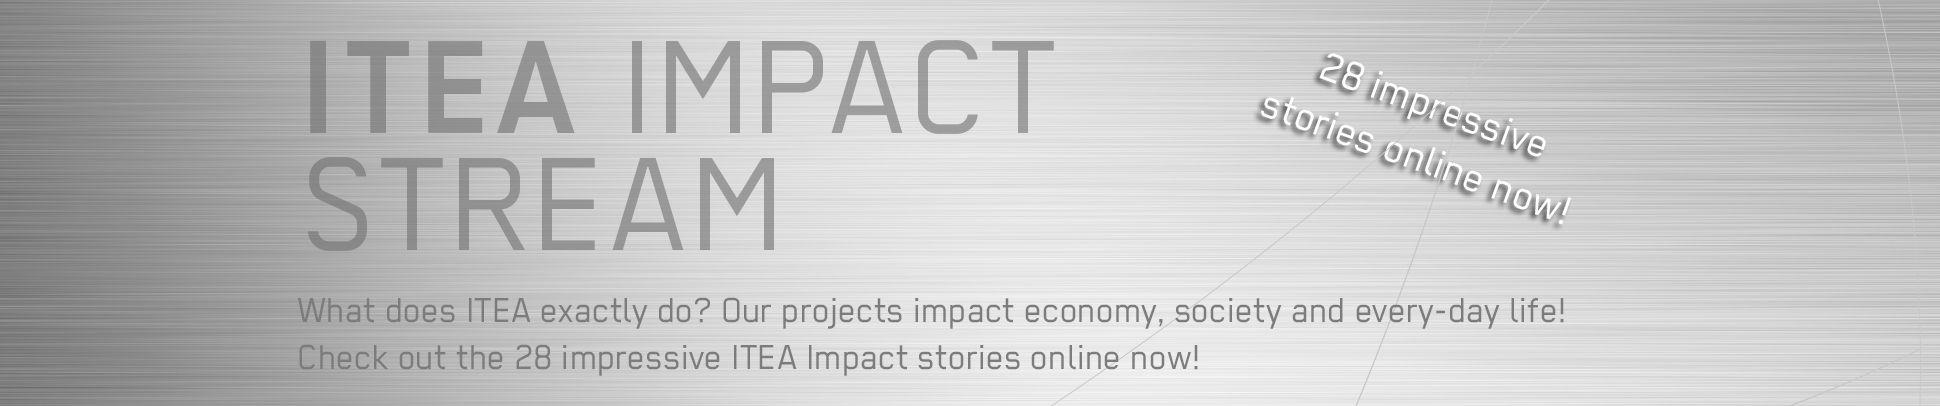 Jumbotron ITEA Impact stream November 2020